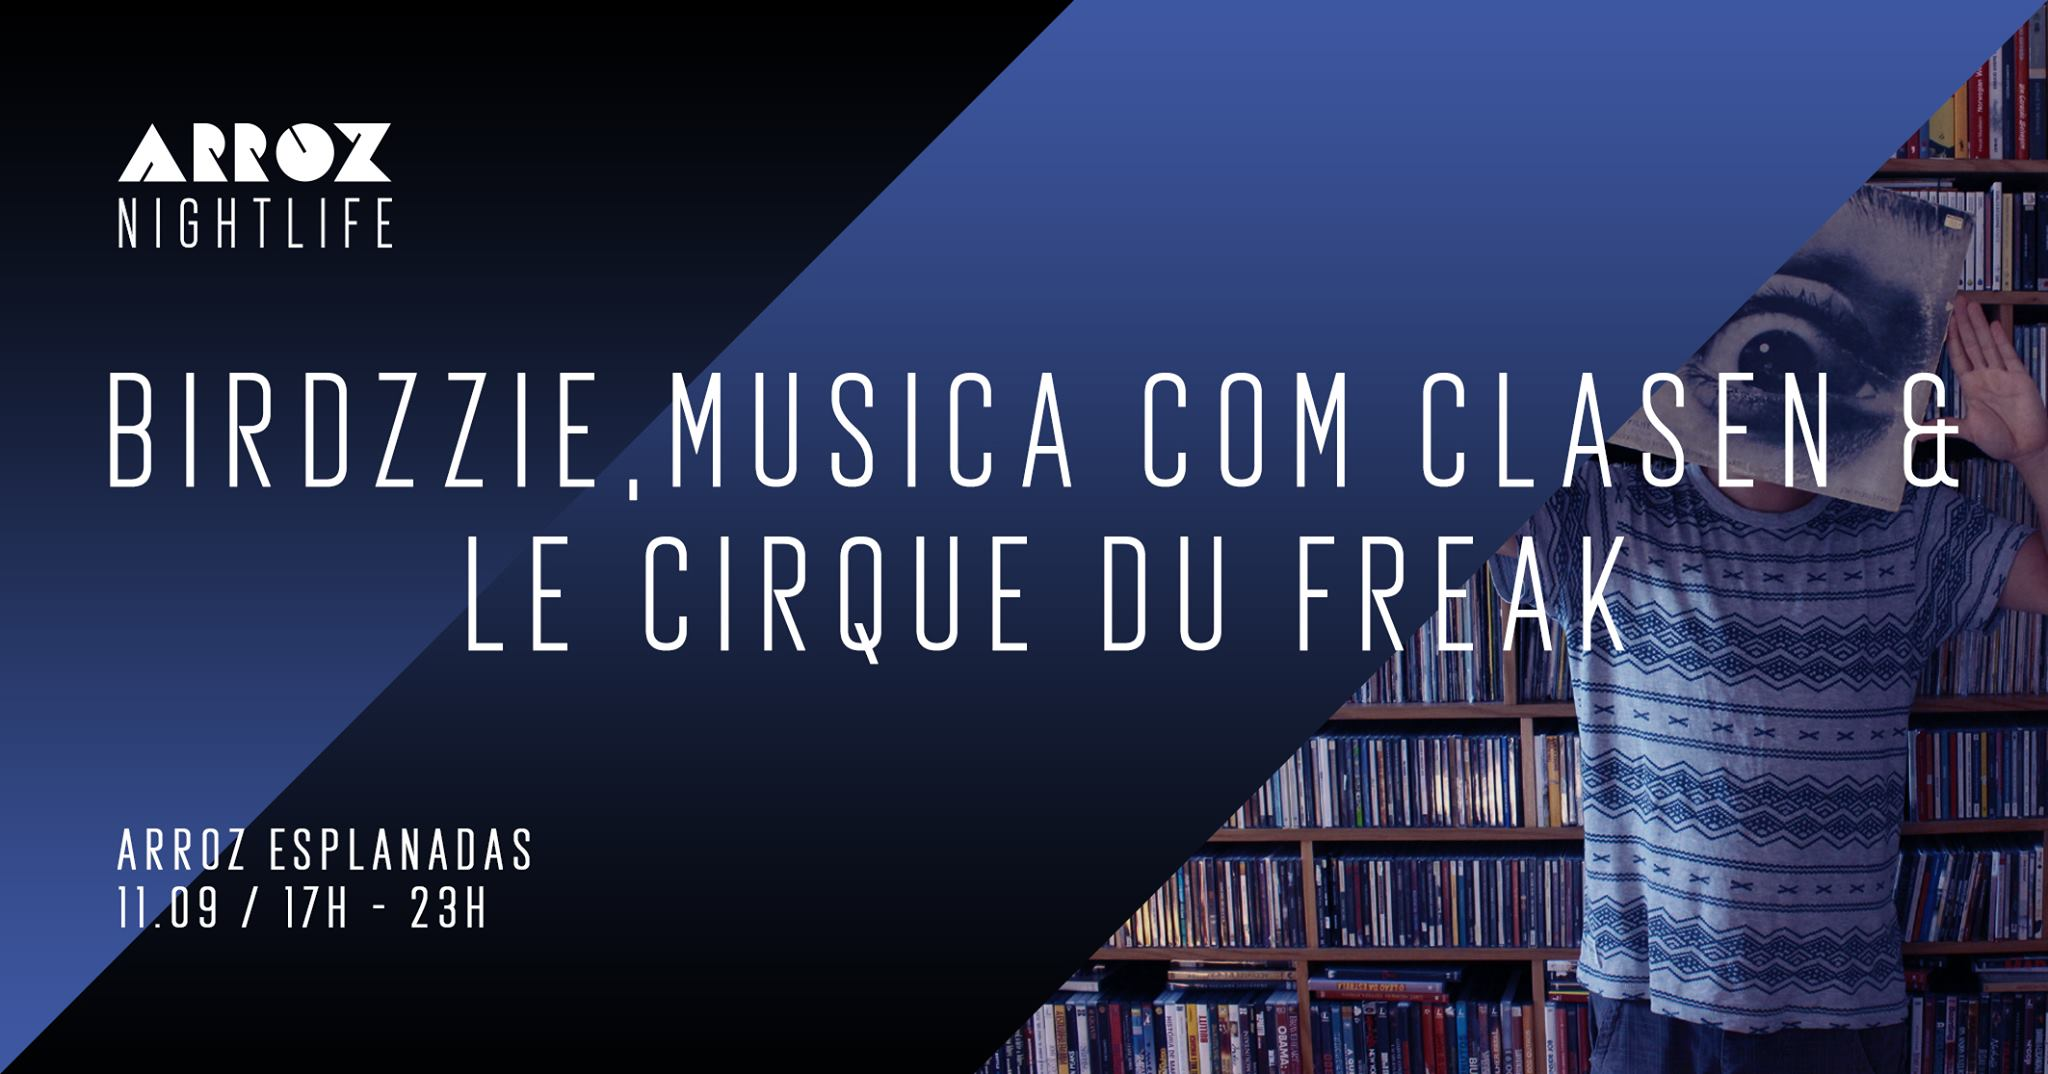 Ornitologia - Birdzzie + Musica com Clasen + Le Cirque du Freak